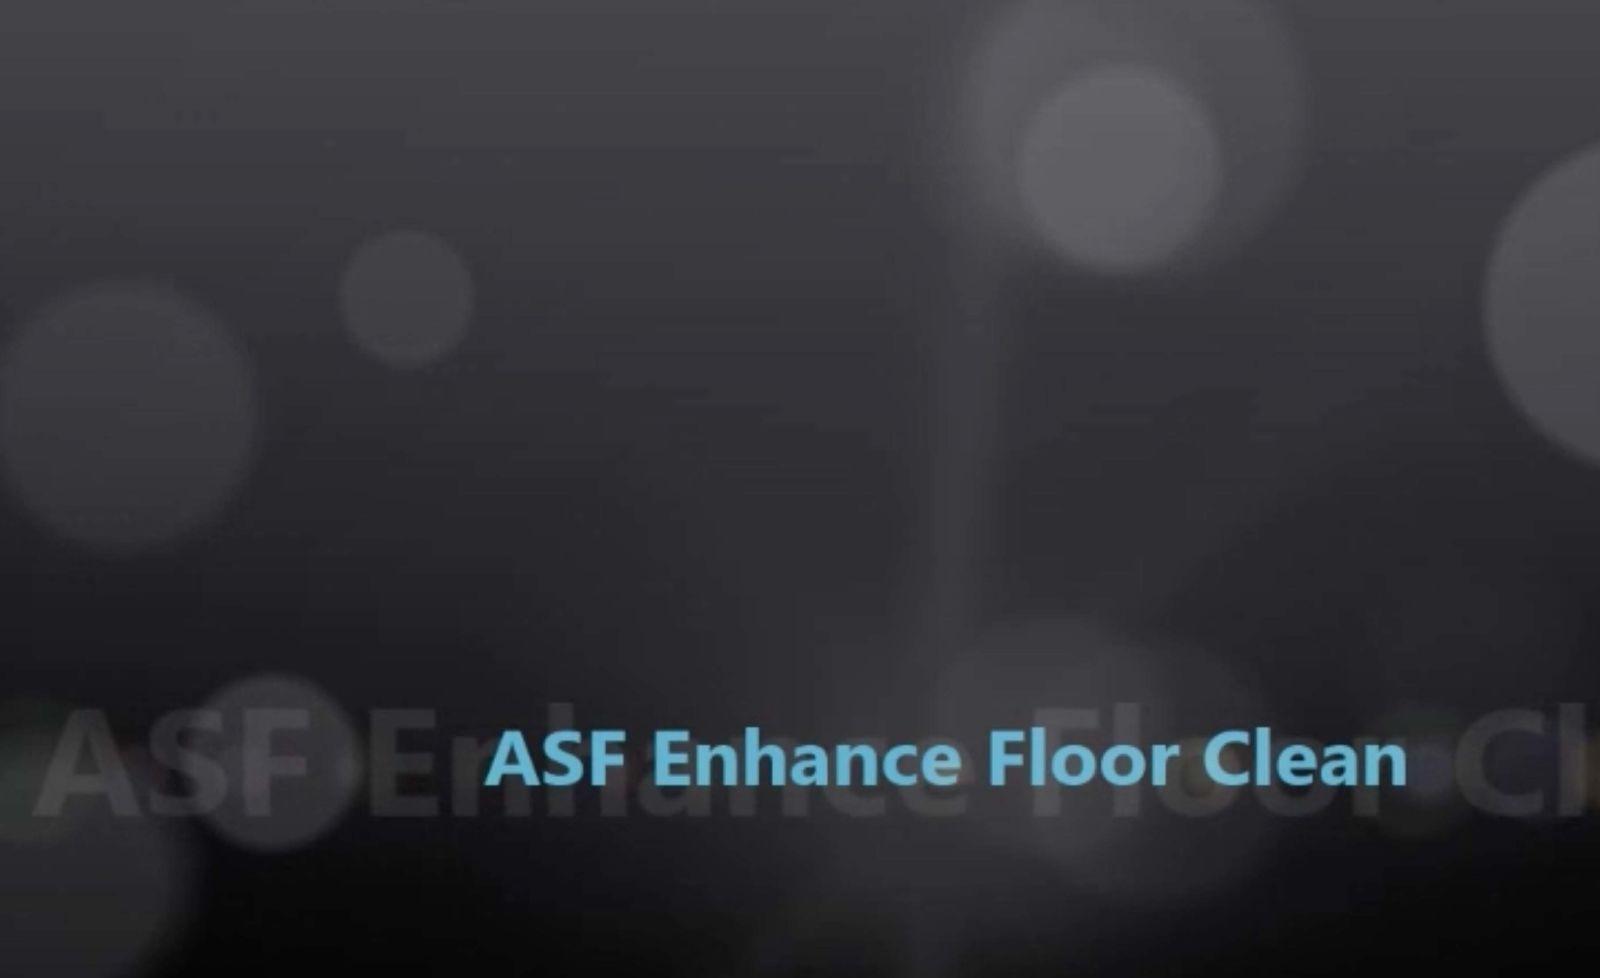 Enhance Floor Cleaning Equipment